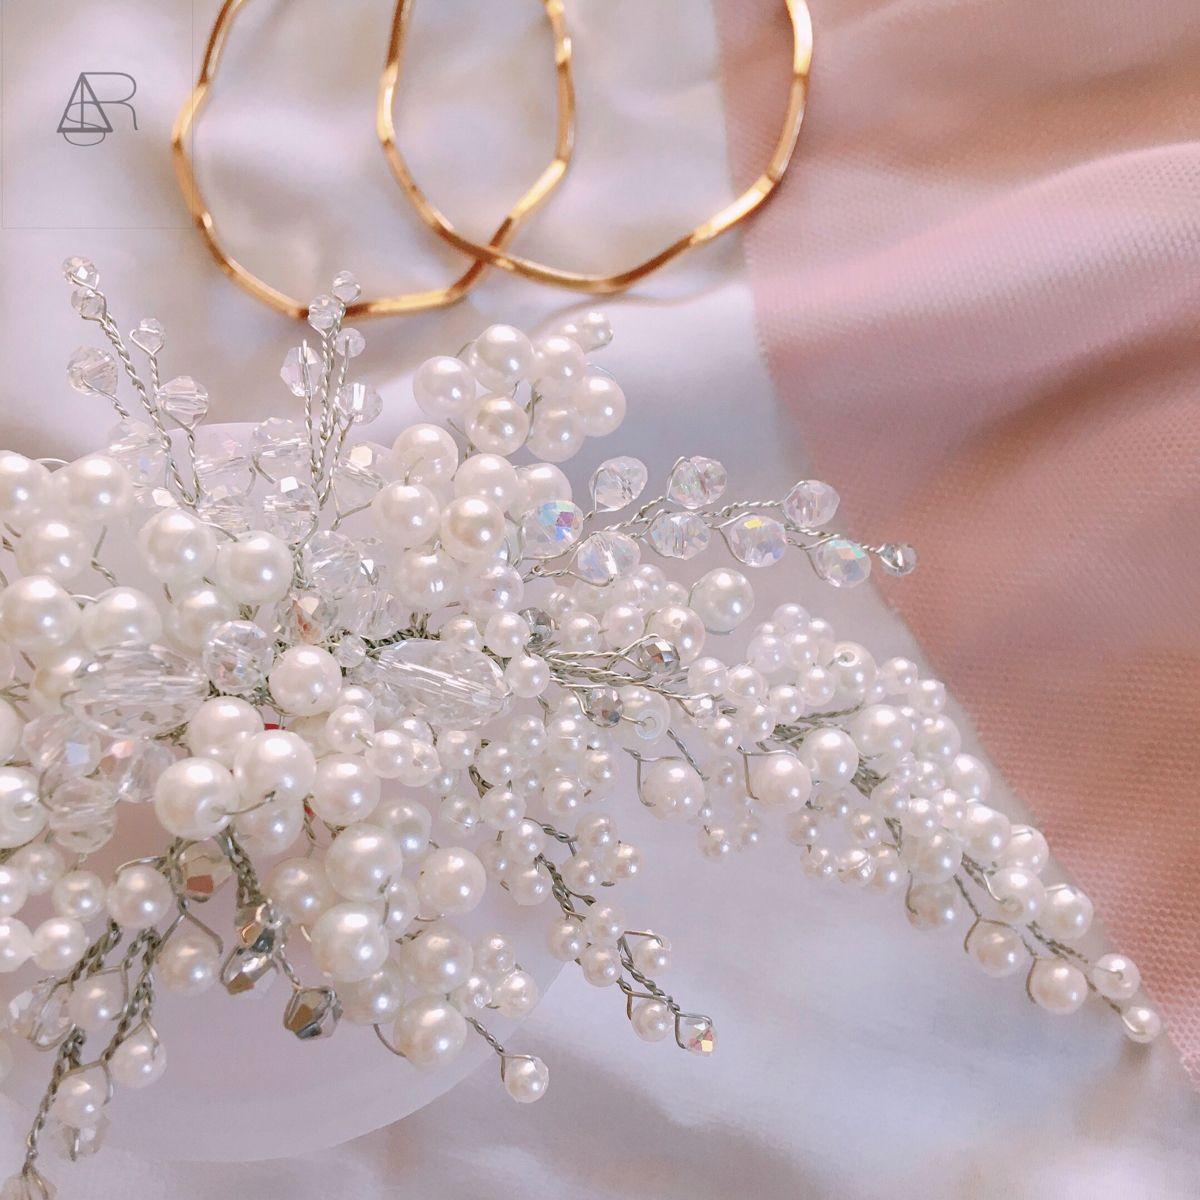 Aksessuar Dlya Volos Crown Jewelry Jewelry Crown